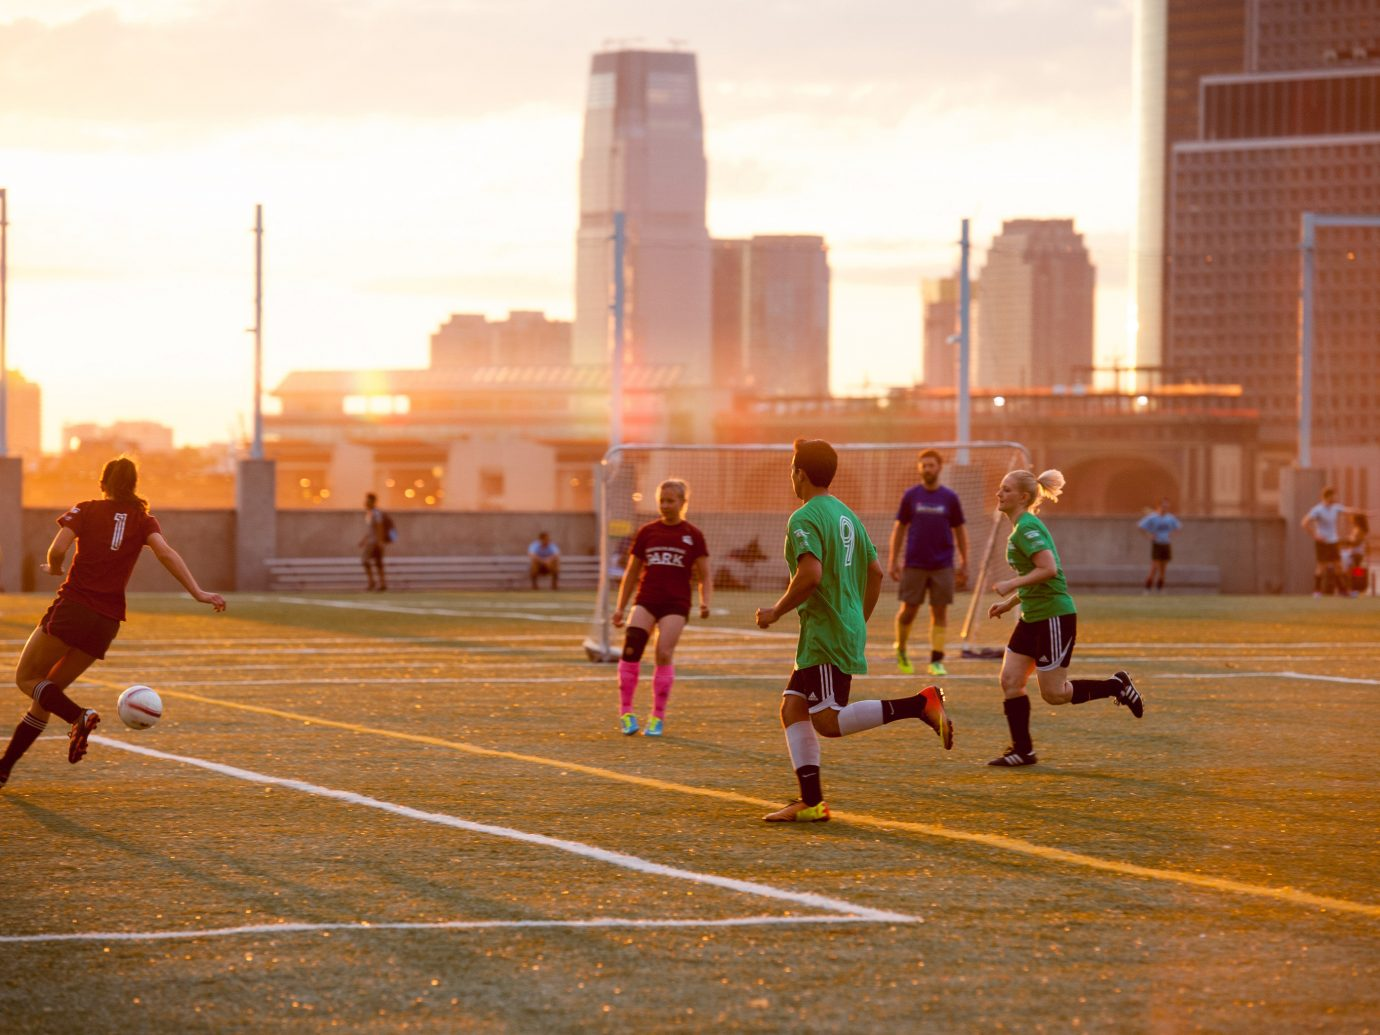 Budget outdoor structure sports sport venue Sport soccer stadium